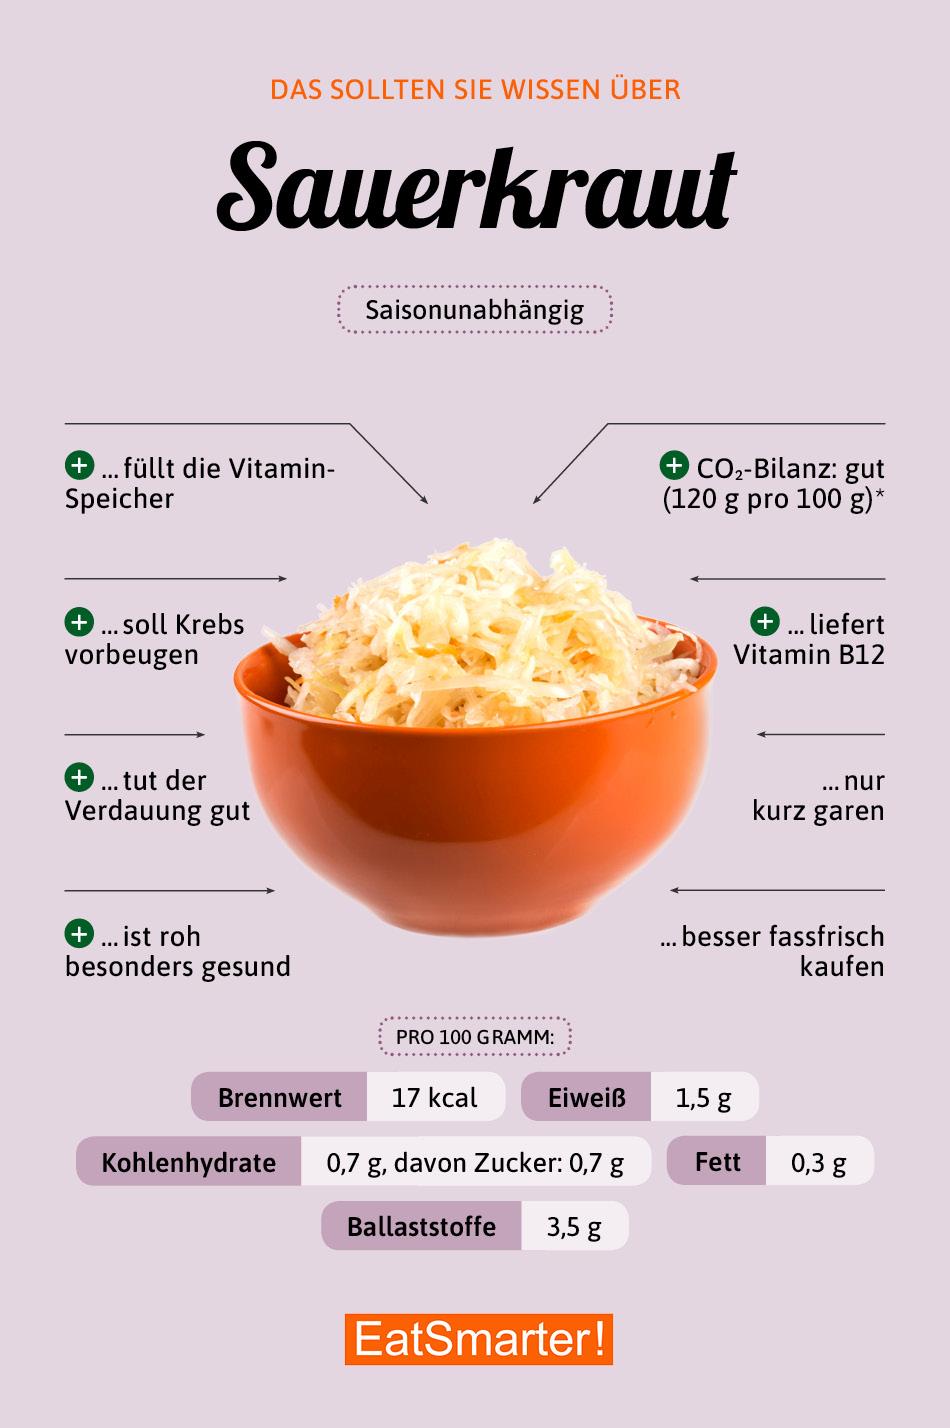 Infografik Sauerkraut